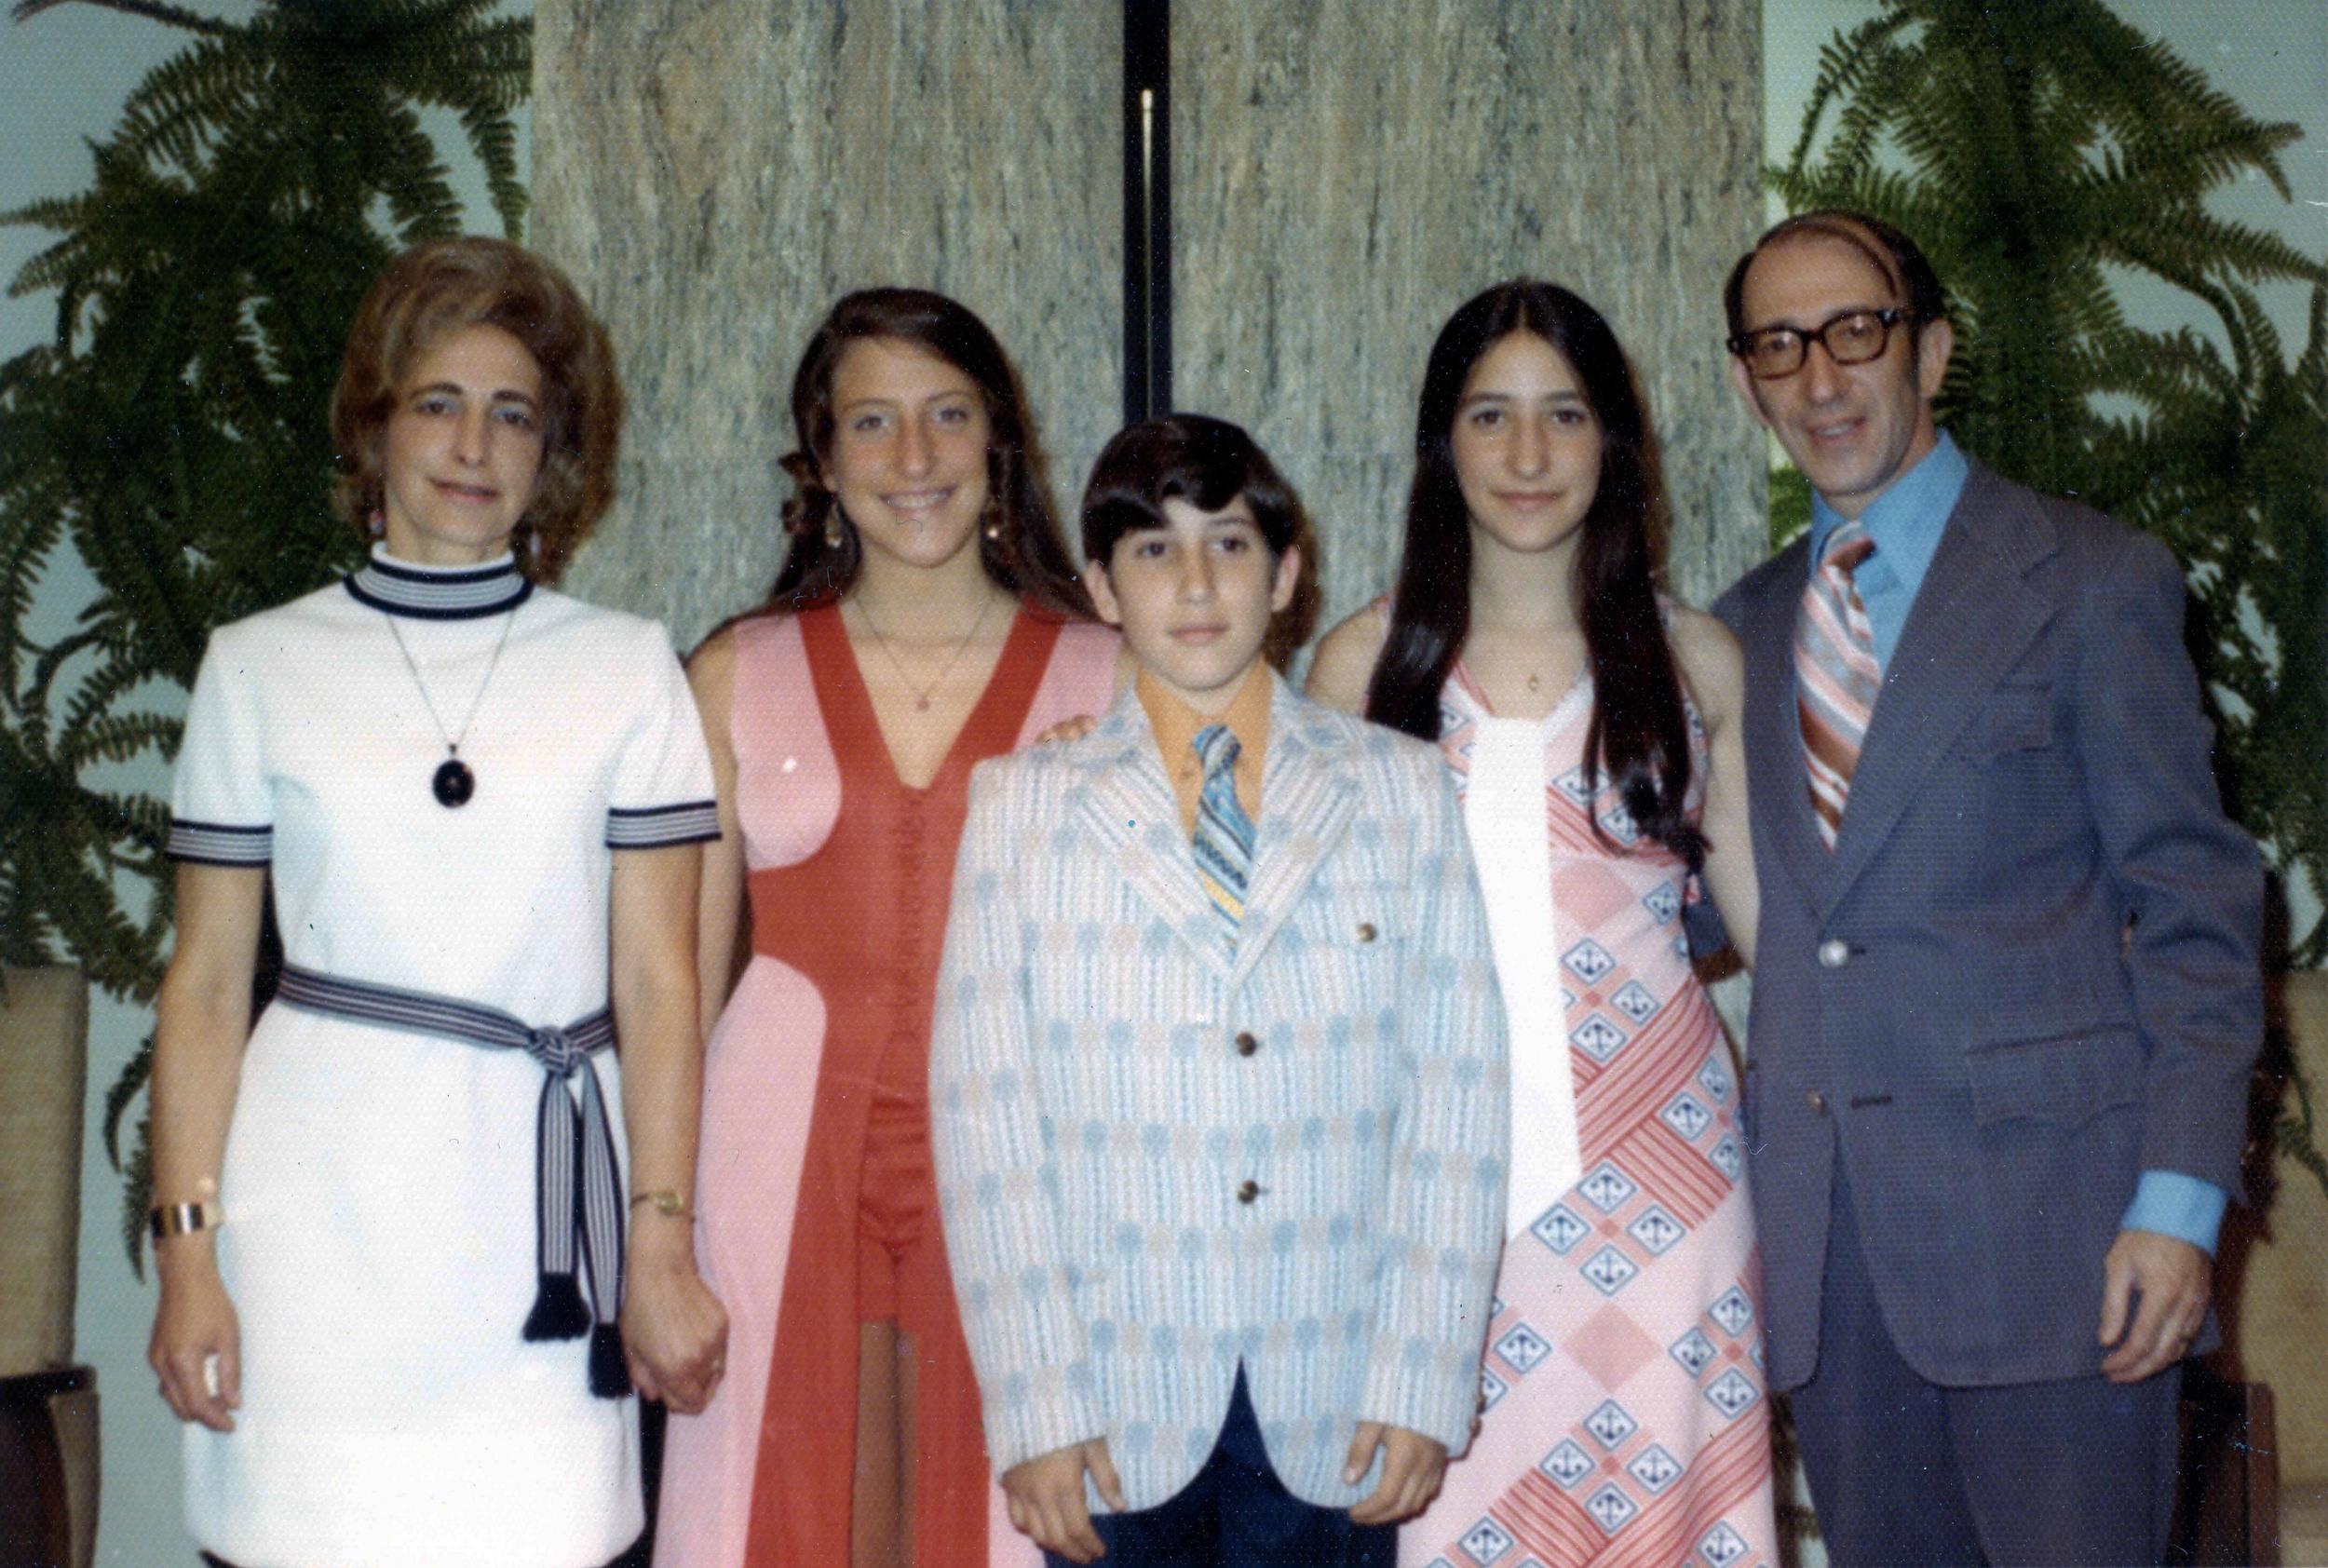 Hana, Ralph and their three children - Nina, Peter, and Janet. Circa 1970s.